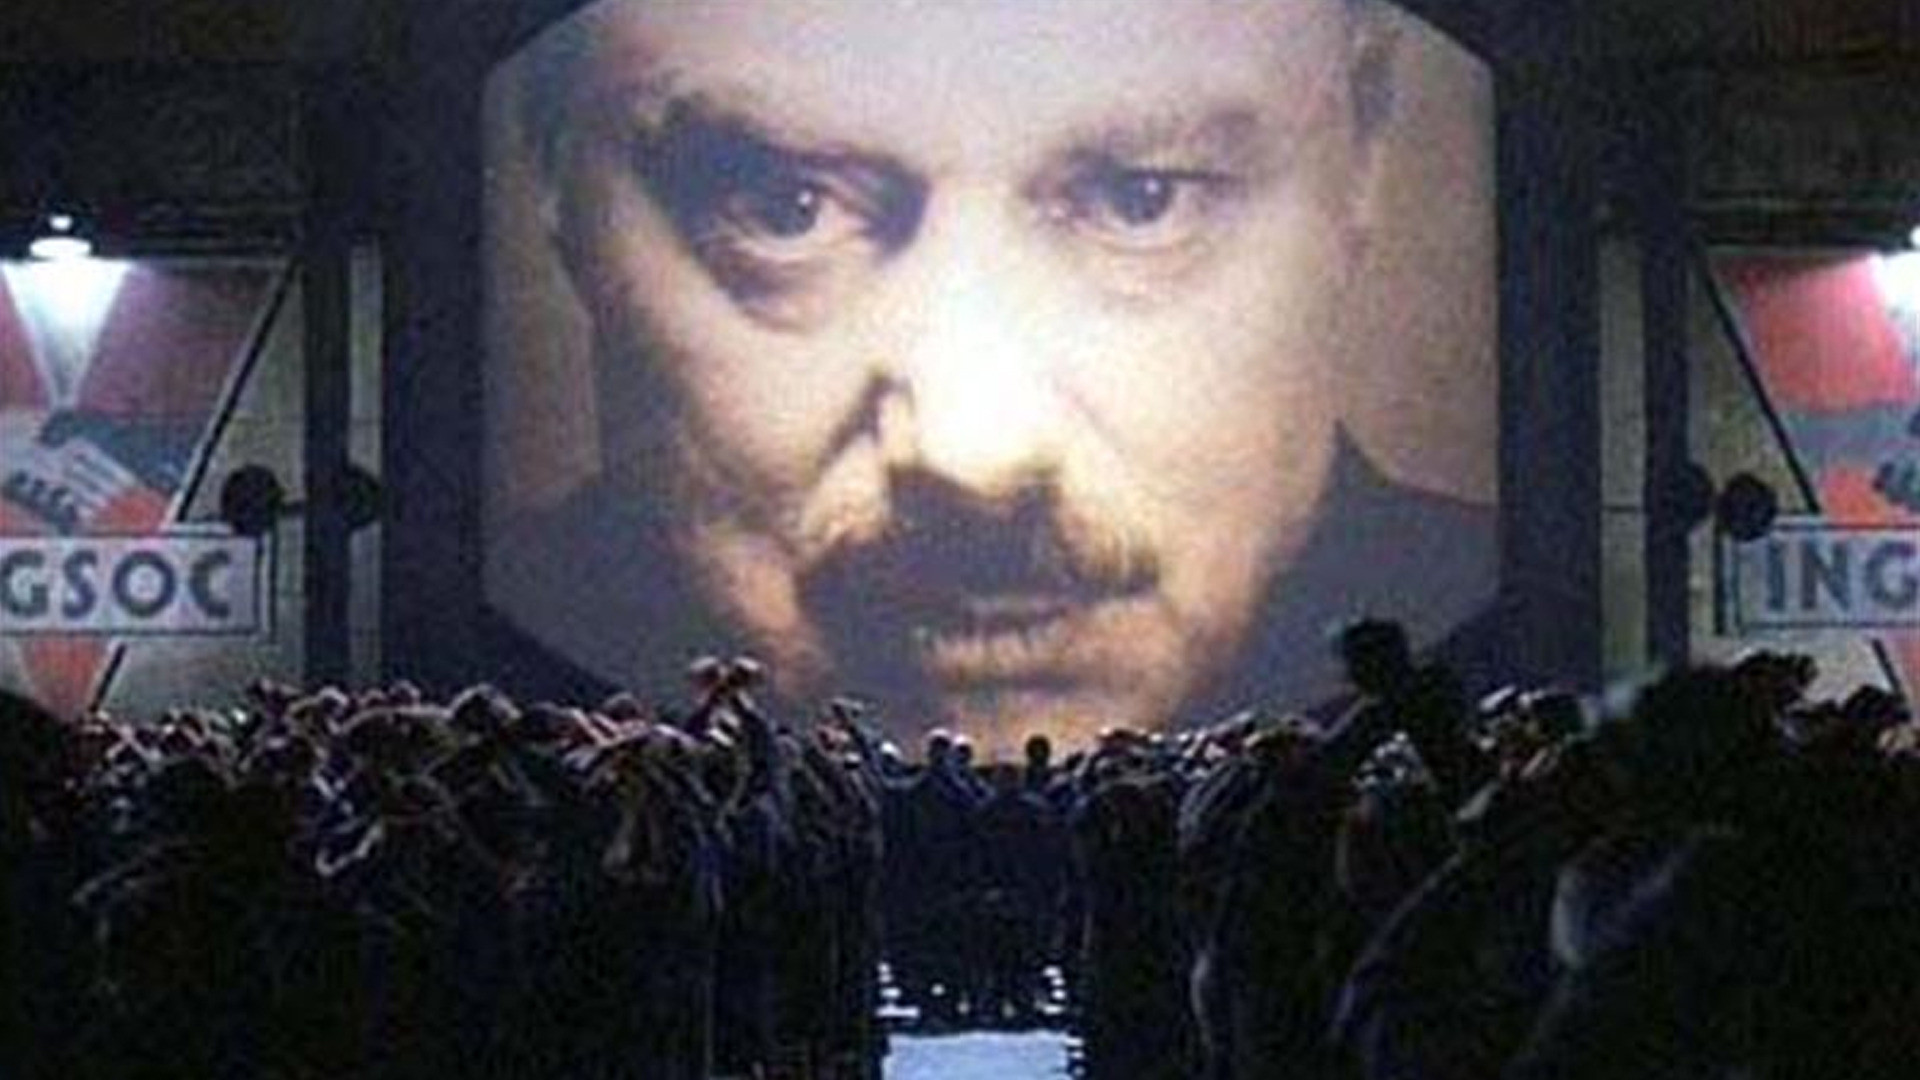 orwells 1984 the book that helped create repulsion toward communism